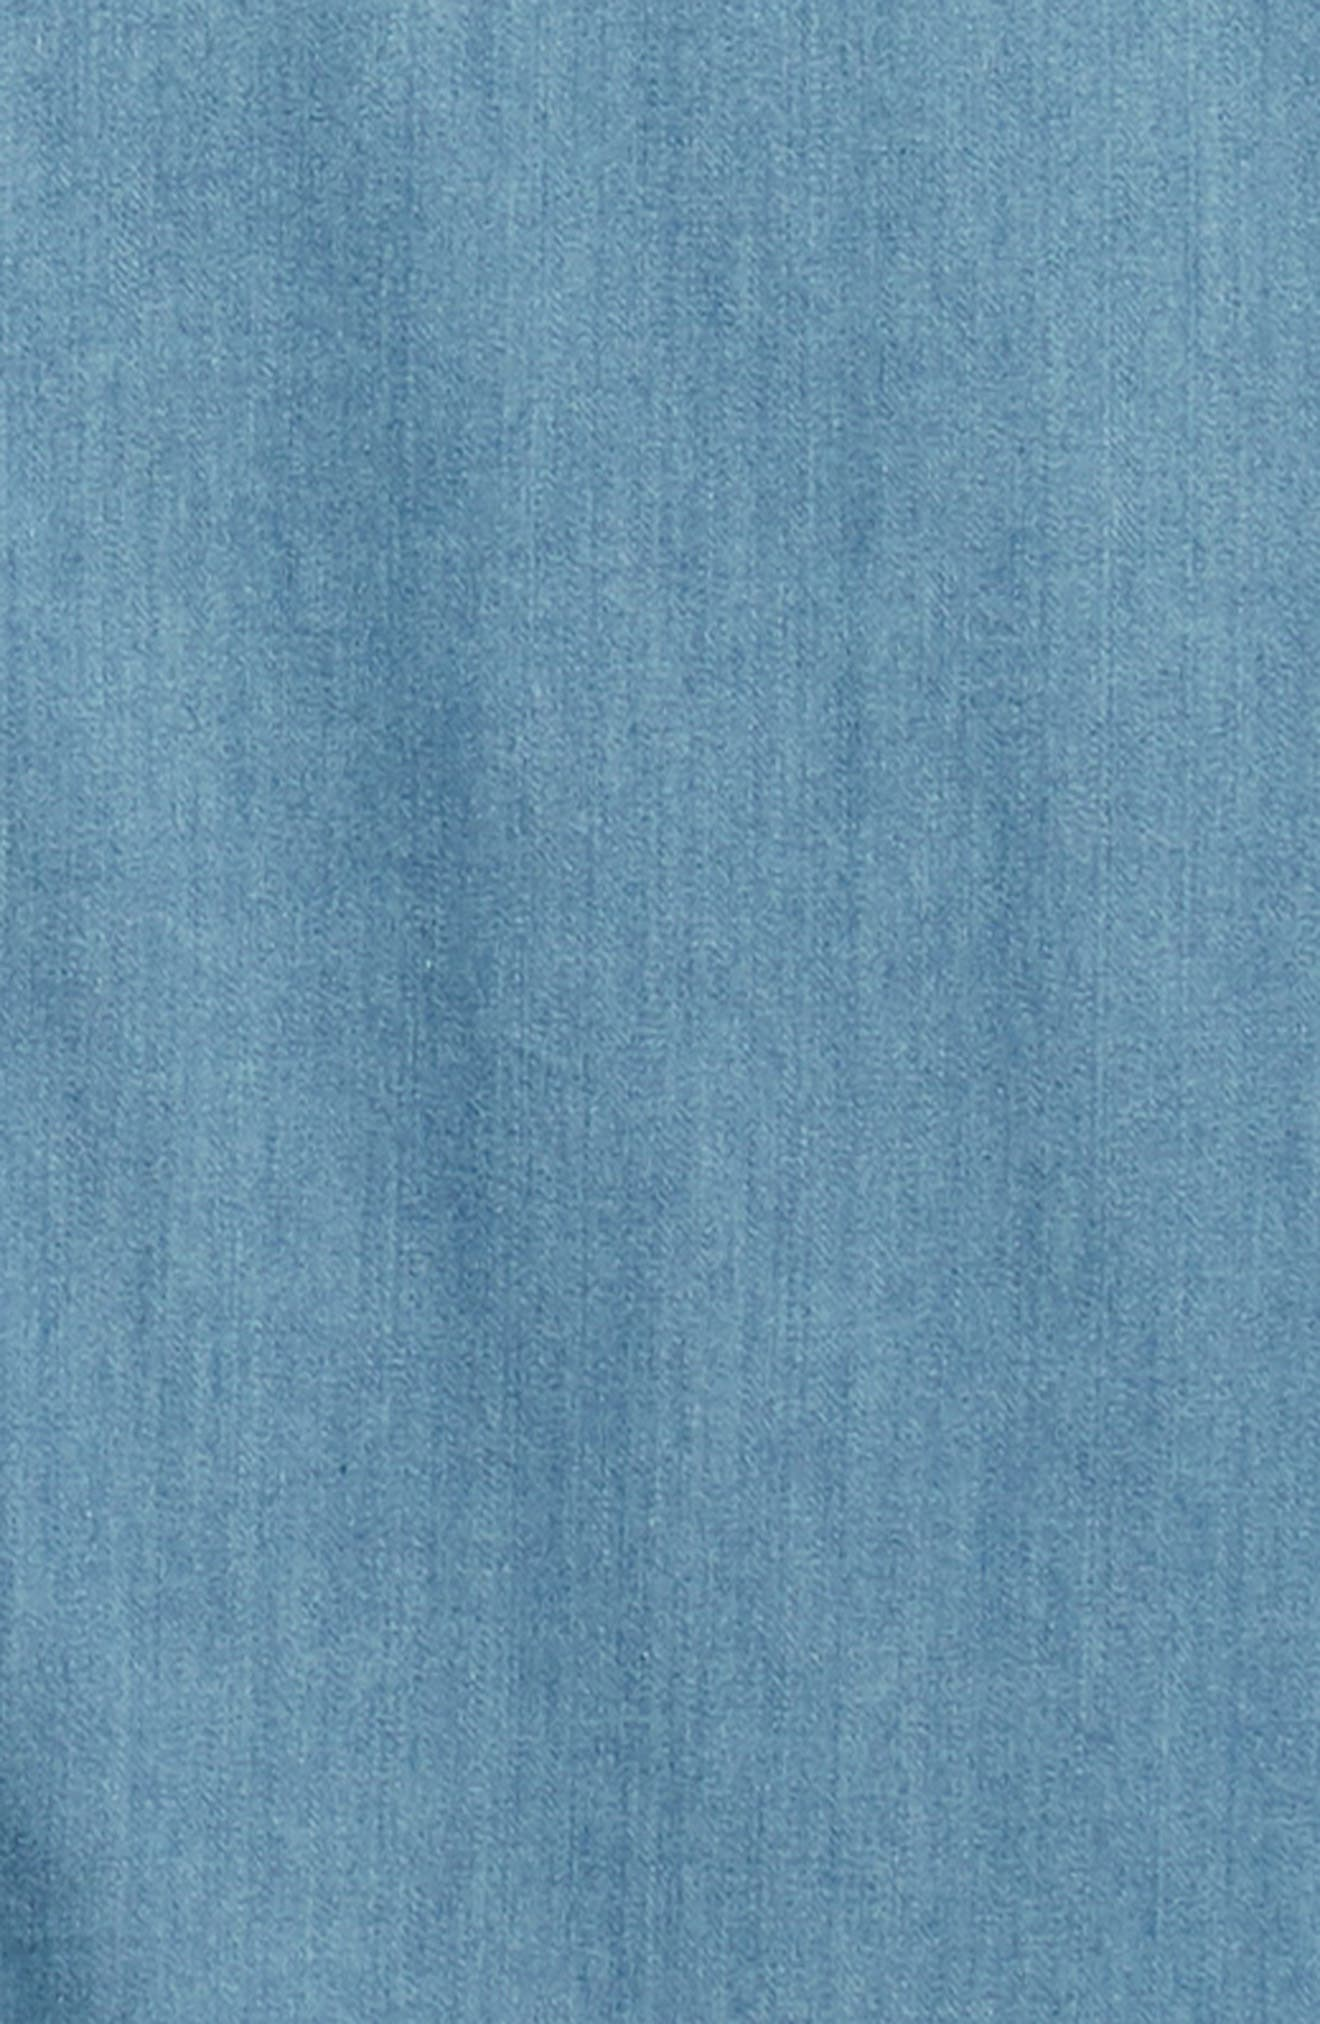 Slim Fit Chambray Sport Shirt,                             Alternate thumbnail 6, color,                             BLUE HEAVEN CHAMBRAY